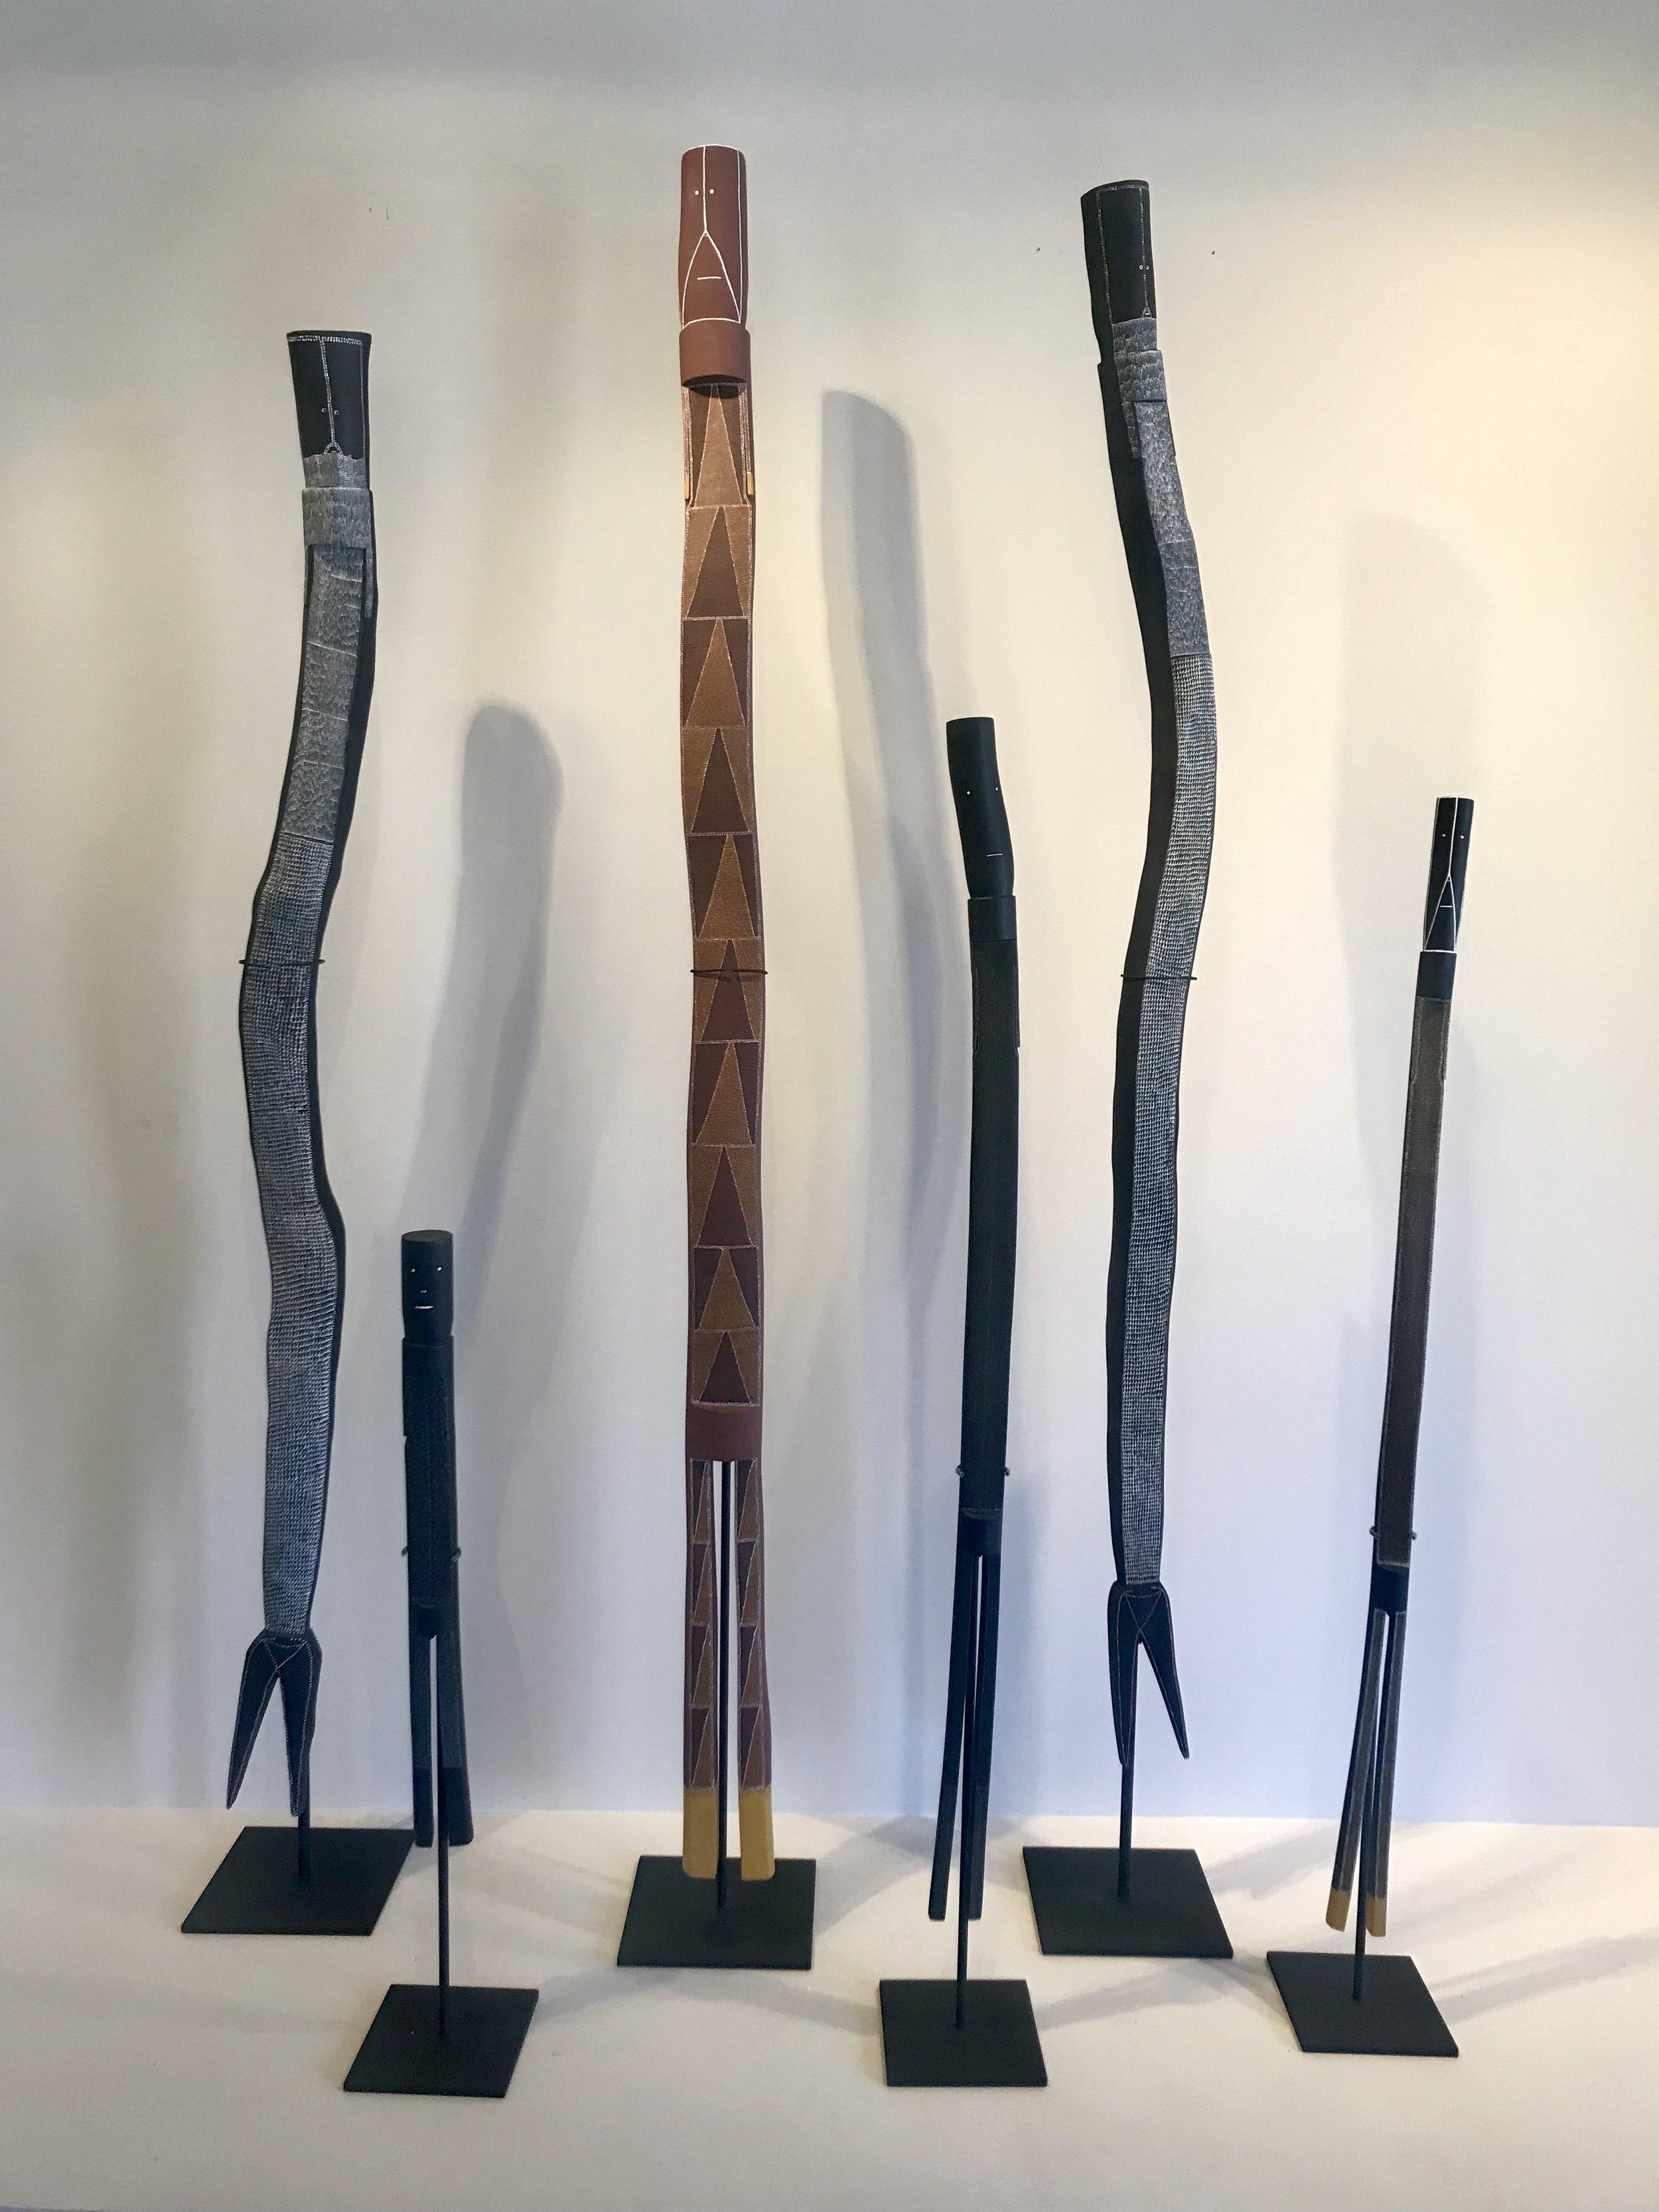 Installation L - R:  Owen Yalandja #3125-18, Don Djorlom #96-18, Sonia Namarnyilk #3129-18, Don Djorlom #1135-19, Owen Yalandja #96-19, Sonia Namarnyilk #987-19